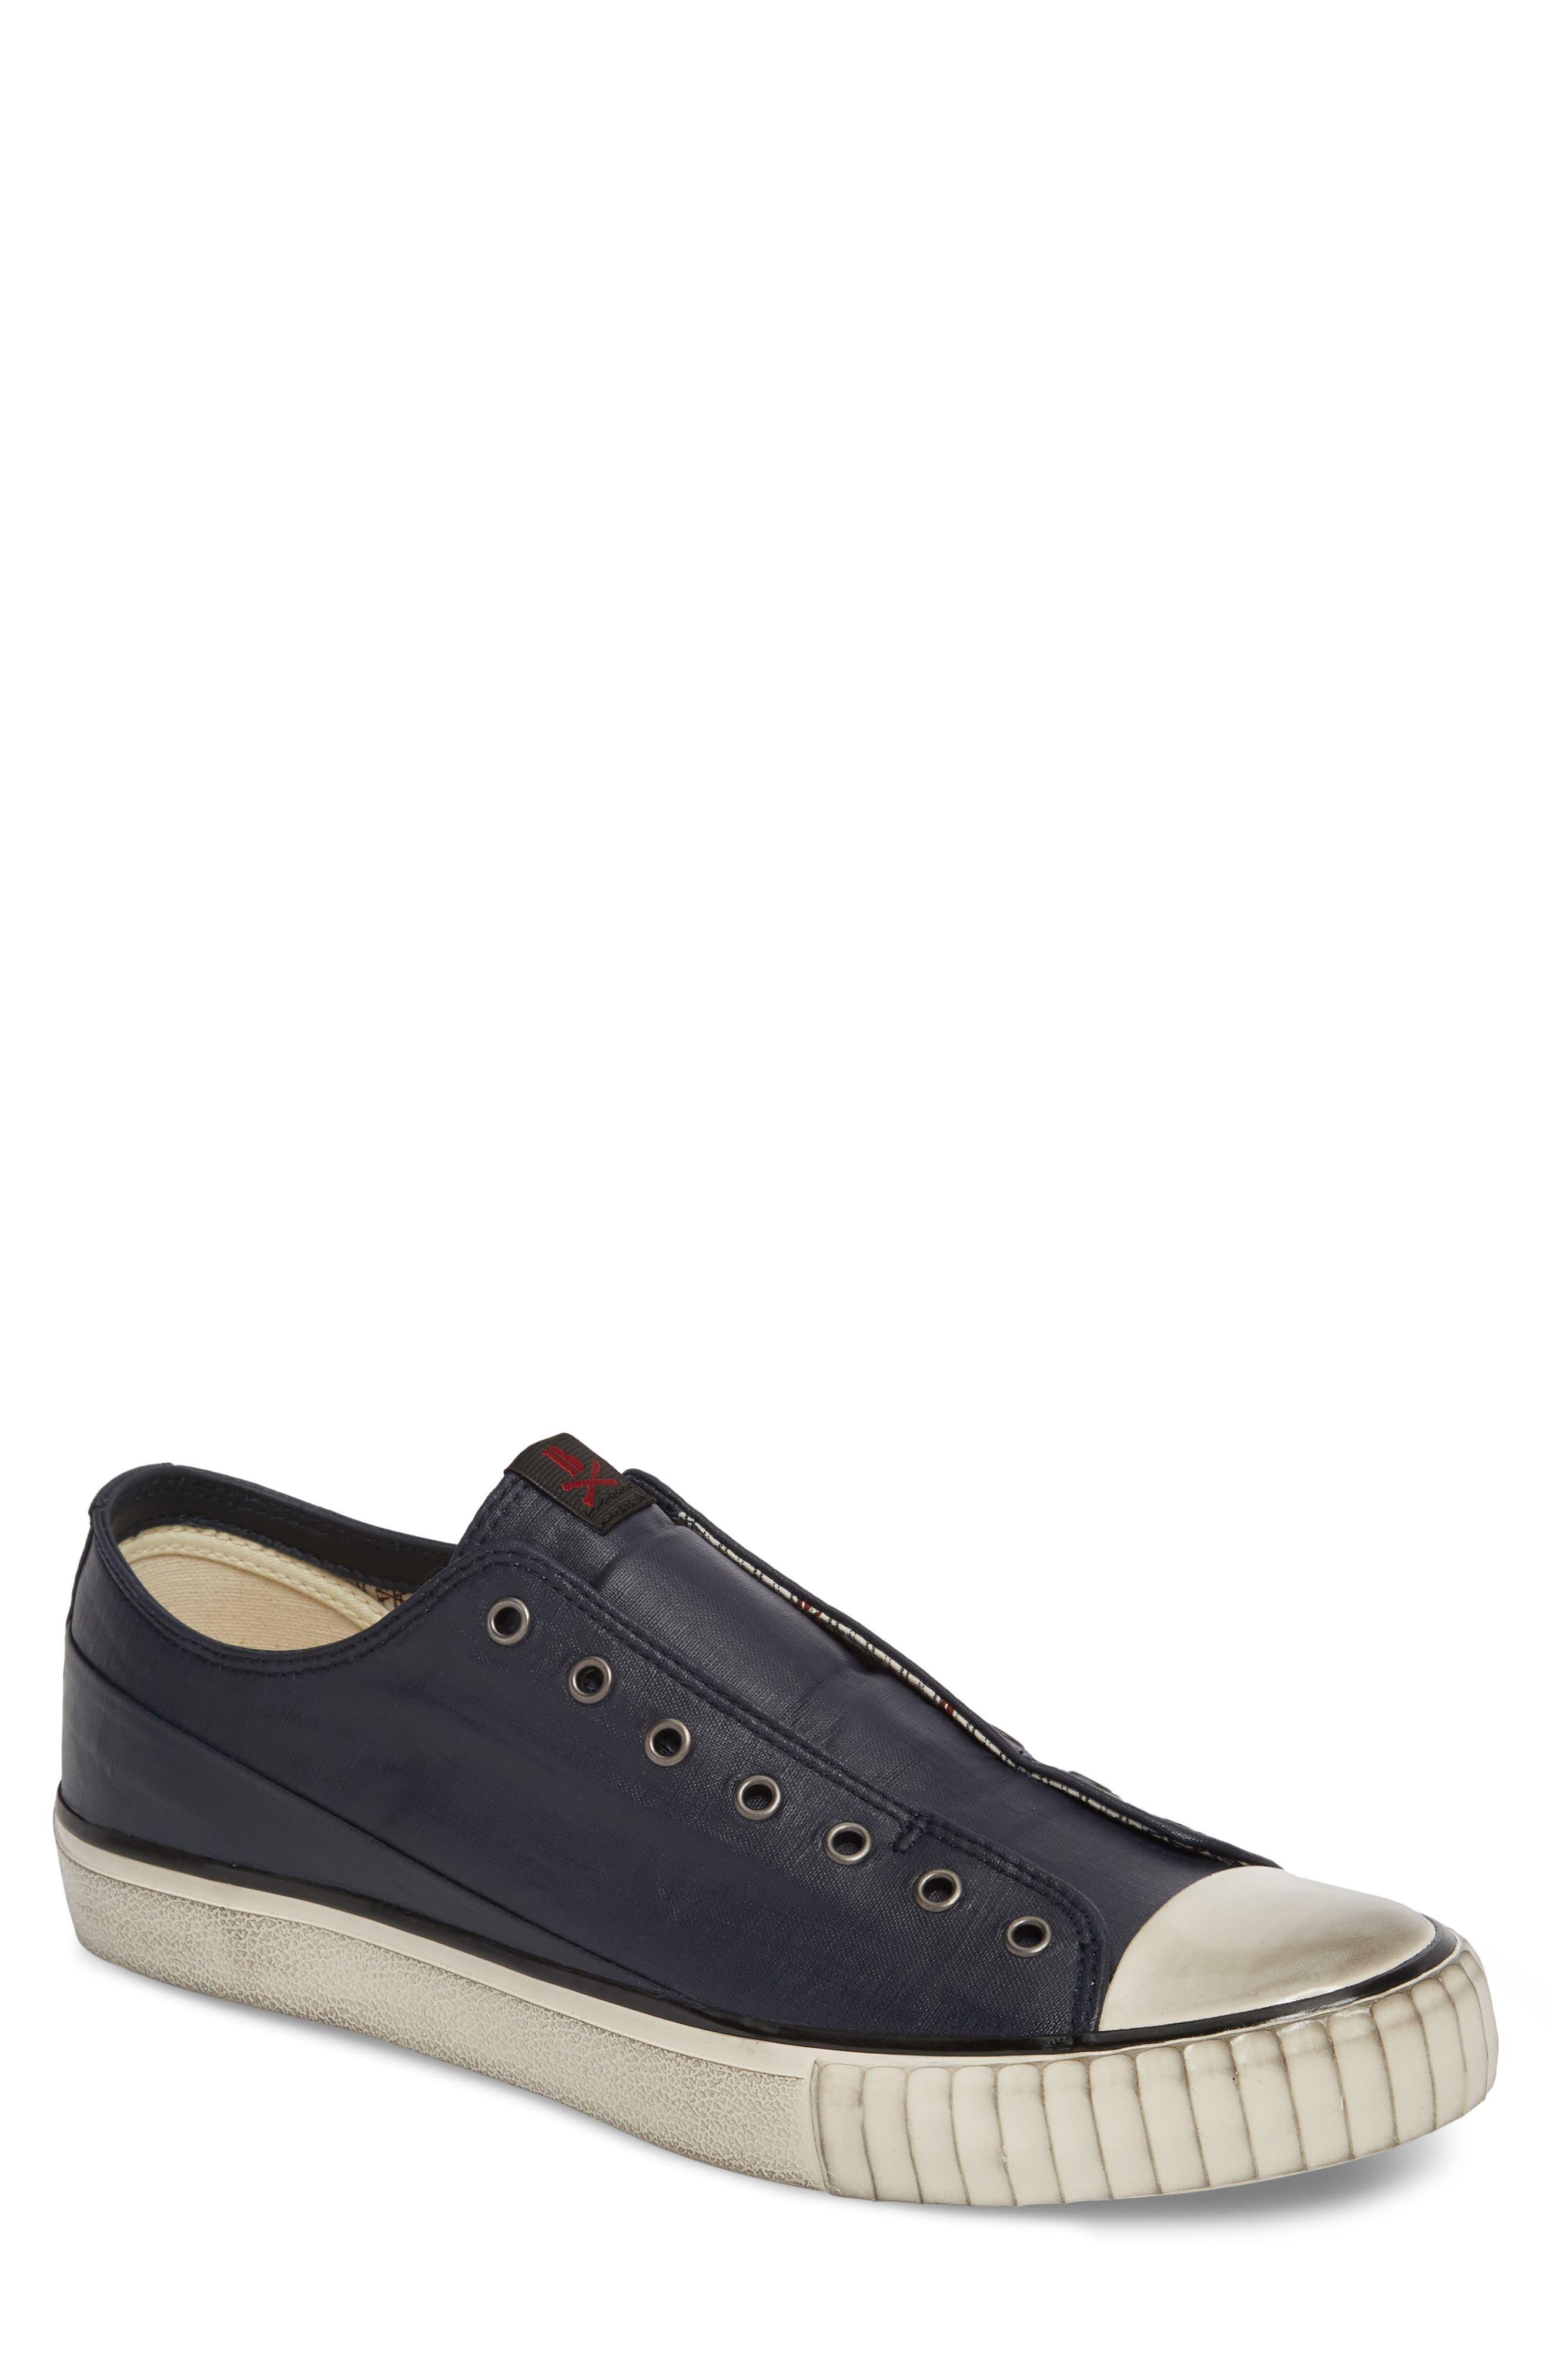 John Varvatos Star USA Bootleg Linen Laceless Sneaker,                         Main,                         color, Midnight Linen